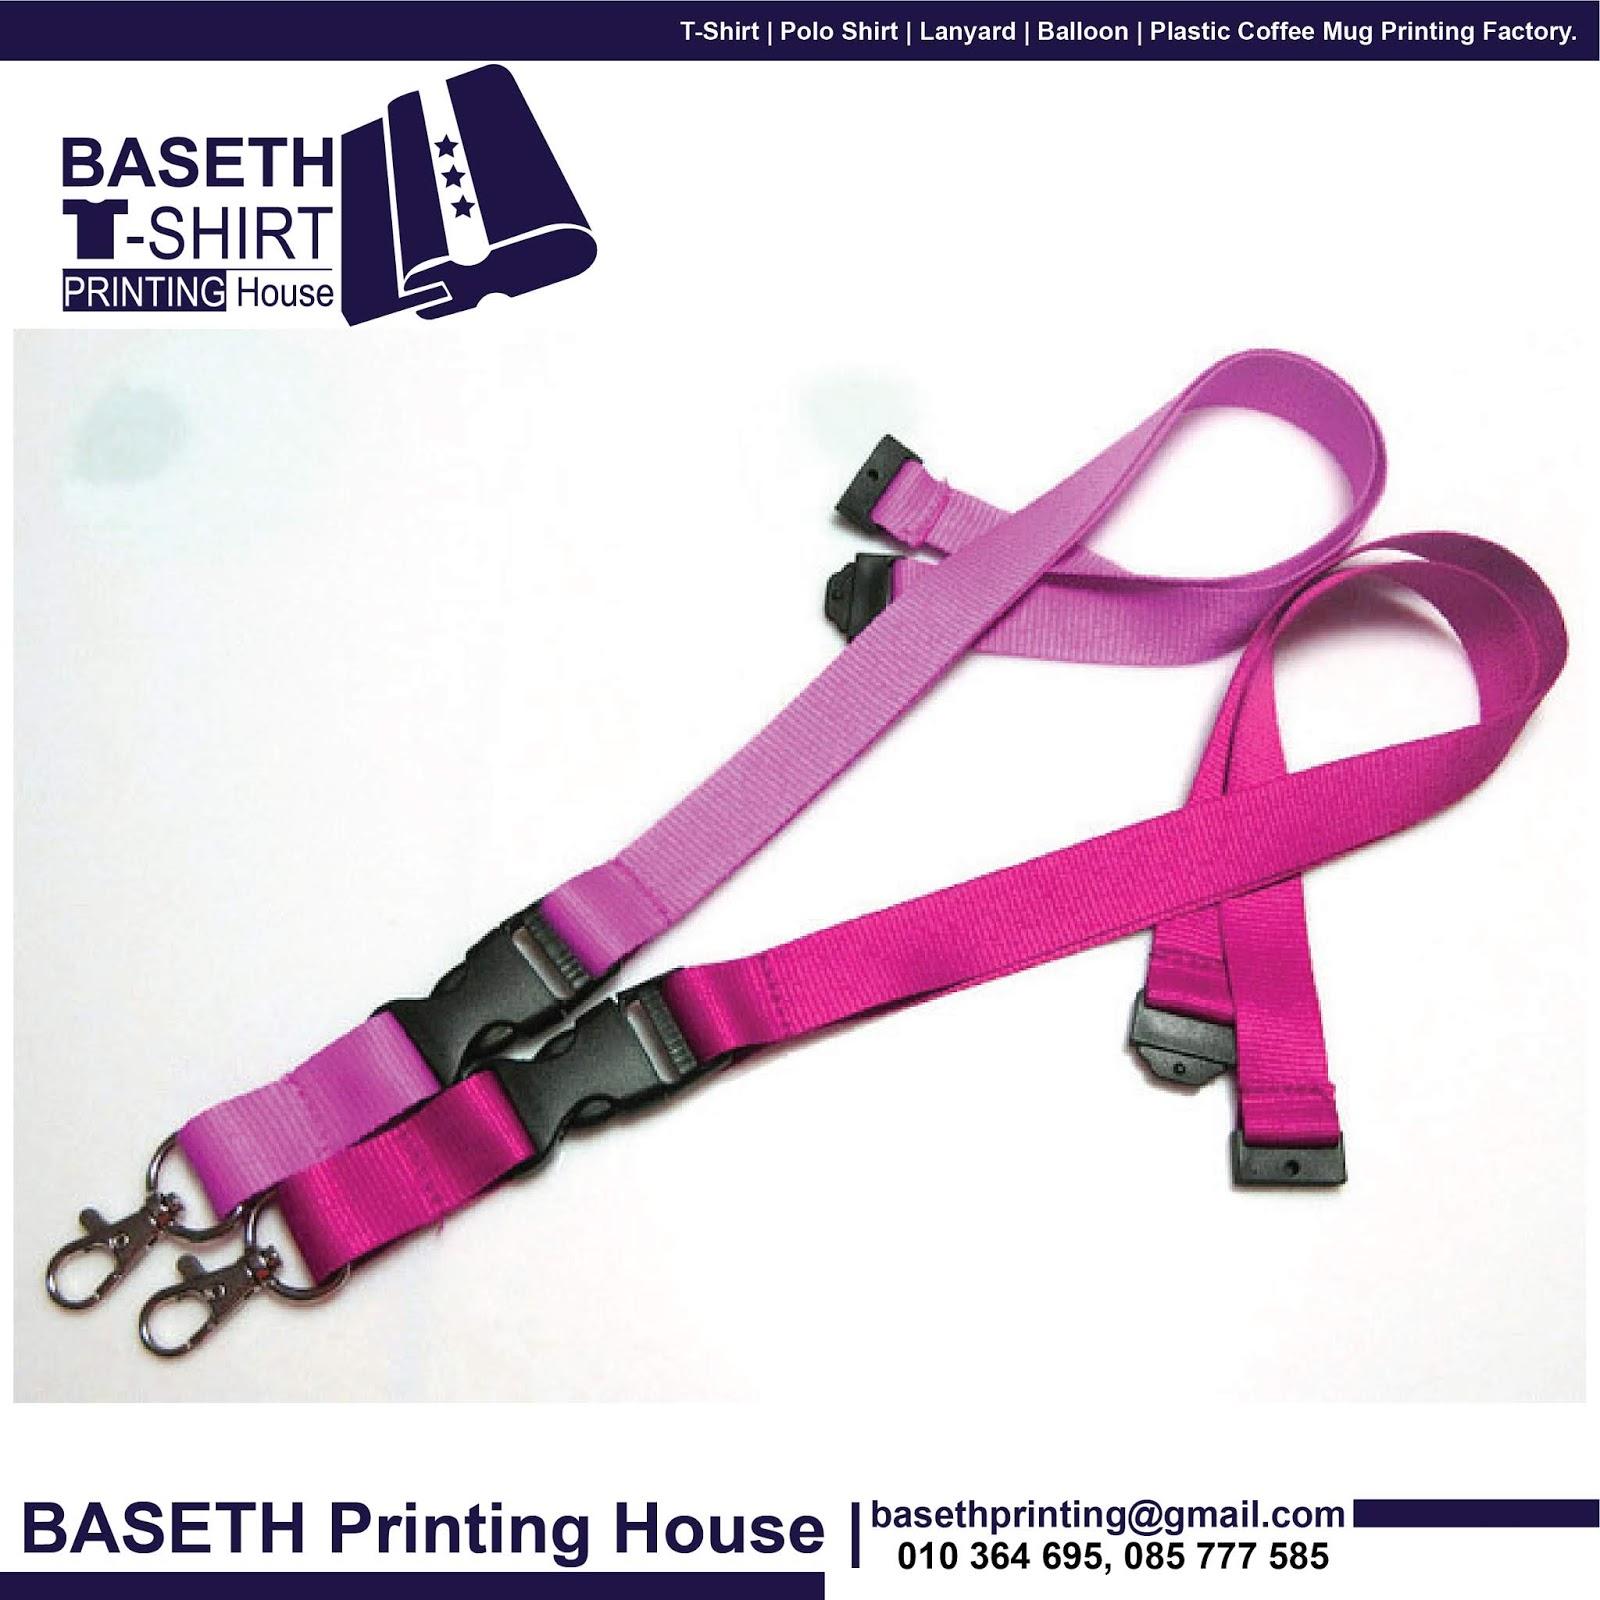 BasethT-Shirt Printing House: Lanyard printing & manufacture with ...